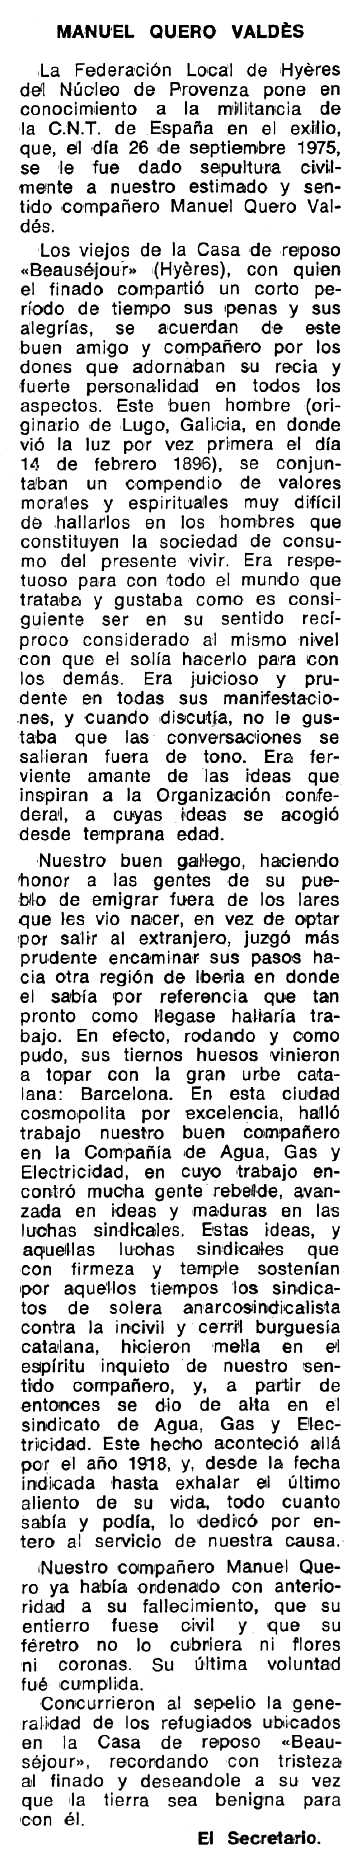 "Necrològica de Manuel Quero Valdés apareguda en el periòdic tolosà ""Espoir"" del 15 de febrer de 1976"